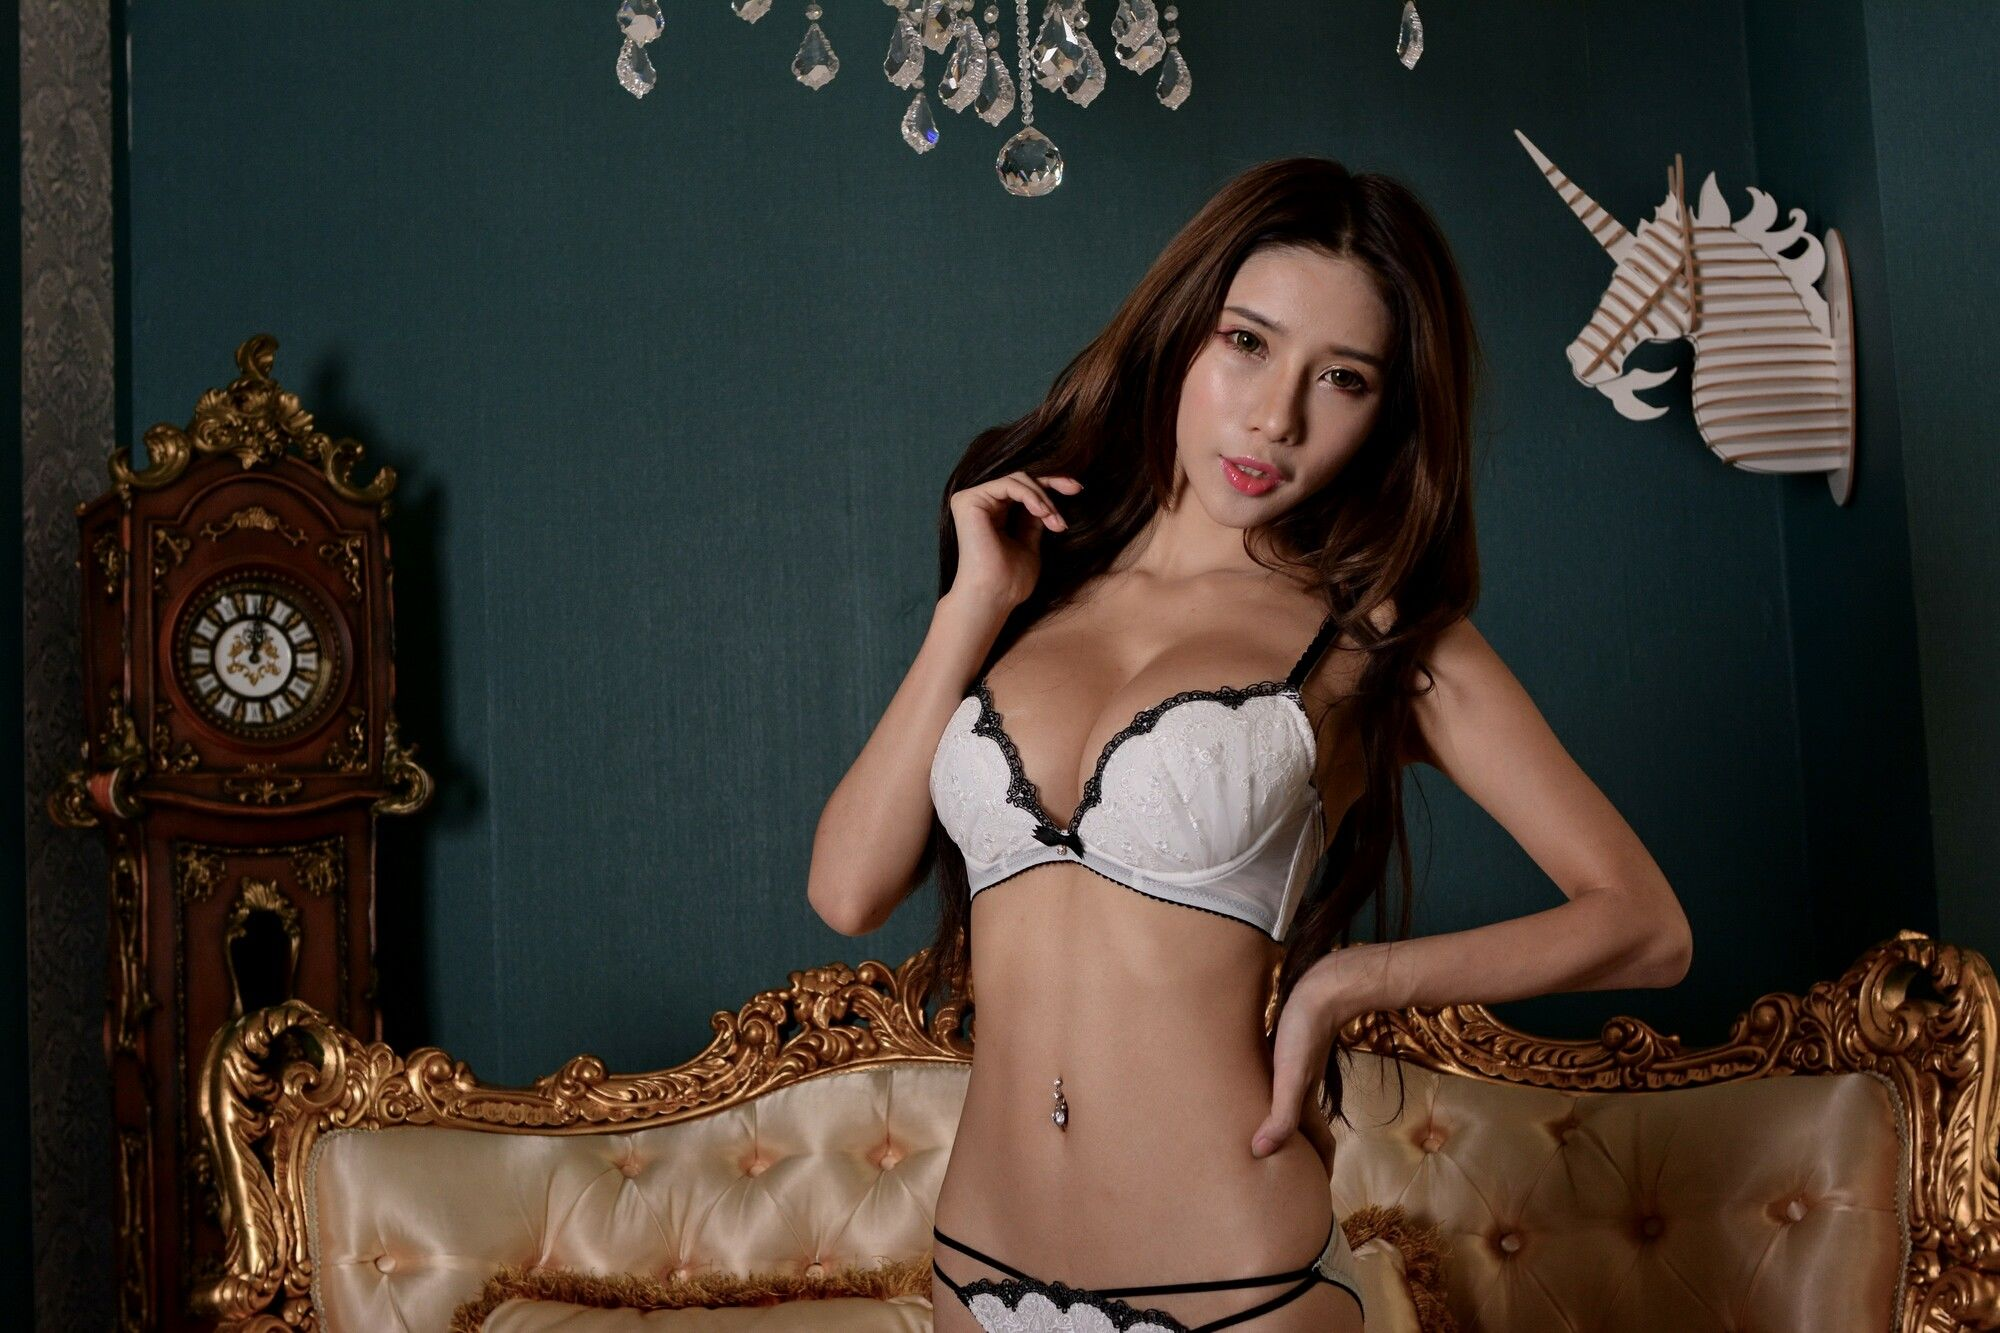 VOL.1496 [台湾正妹]性感美女内衣美女:沈雅琪(沈琪琪Mibo)超高清个人性感漂亮大图(37P)